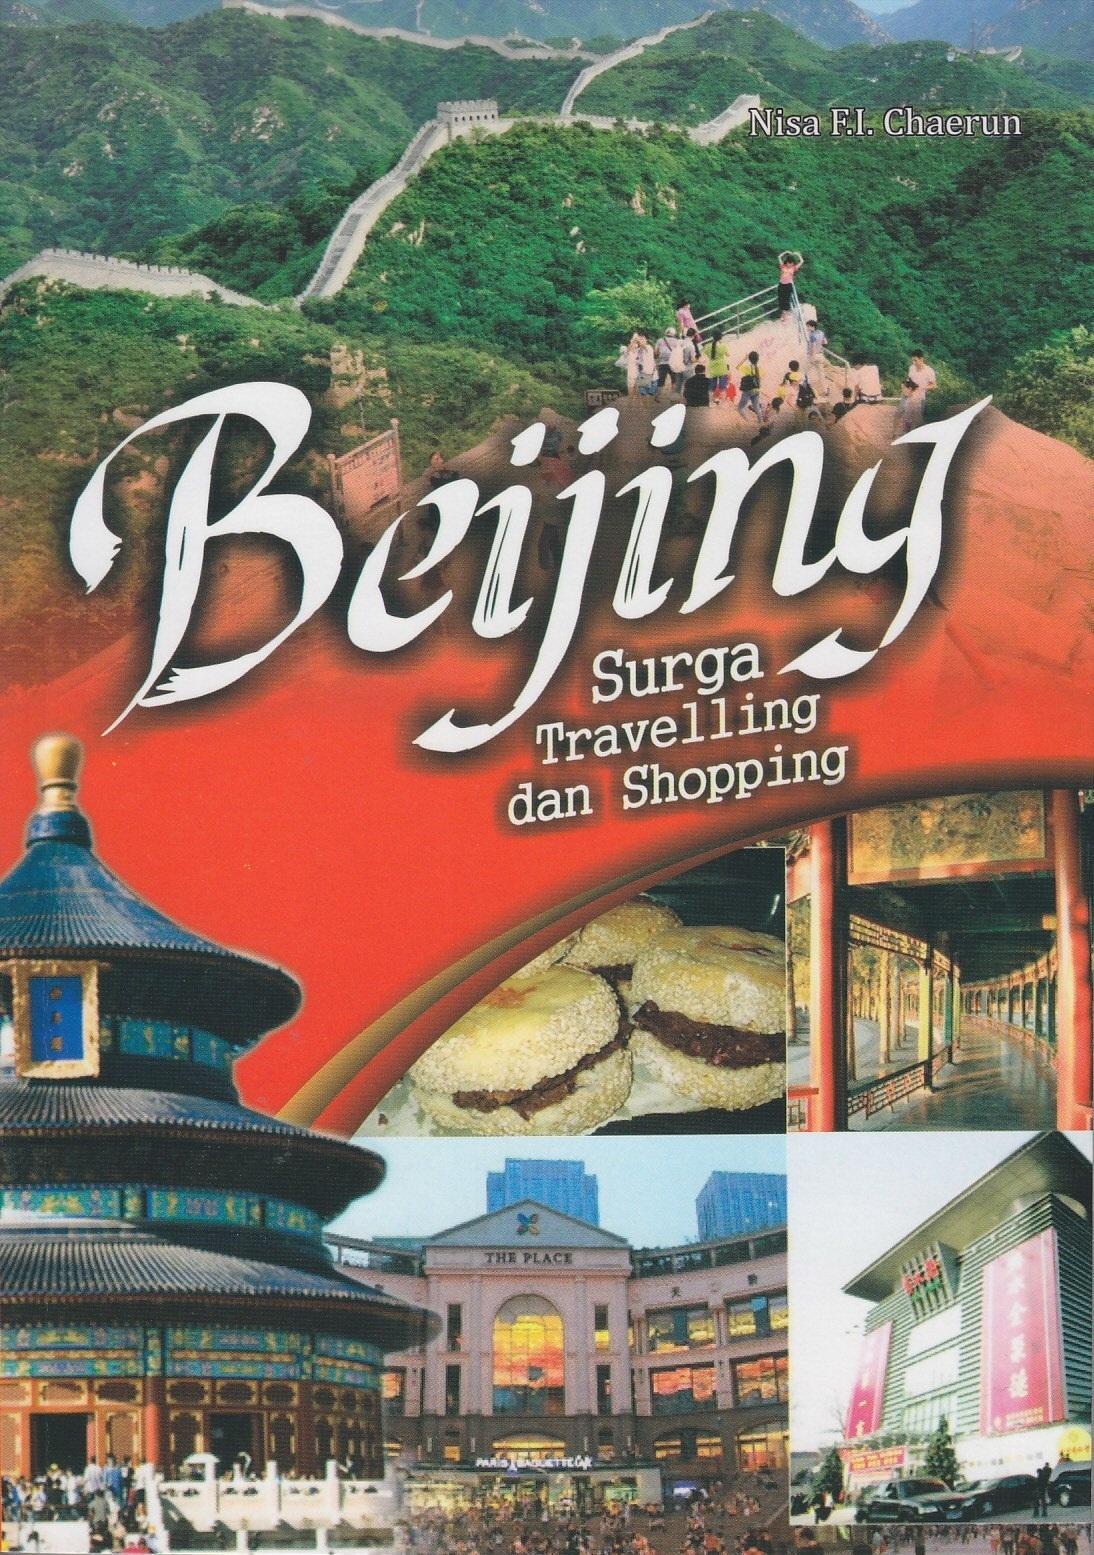 Beijing Surga Travelling dan Shopping Nisa F.I Chaerun